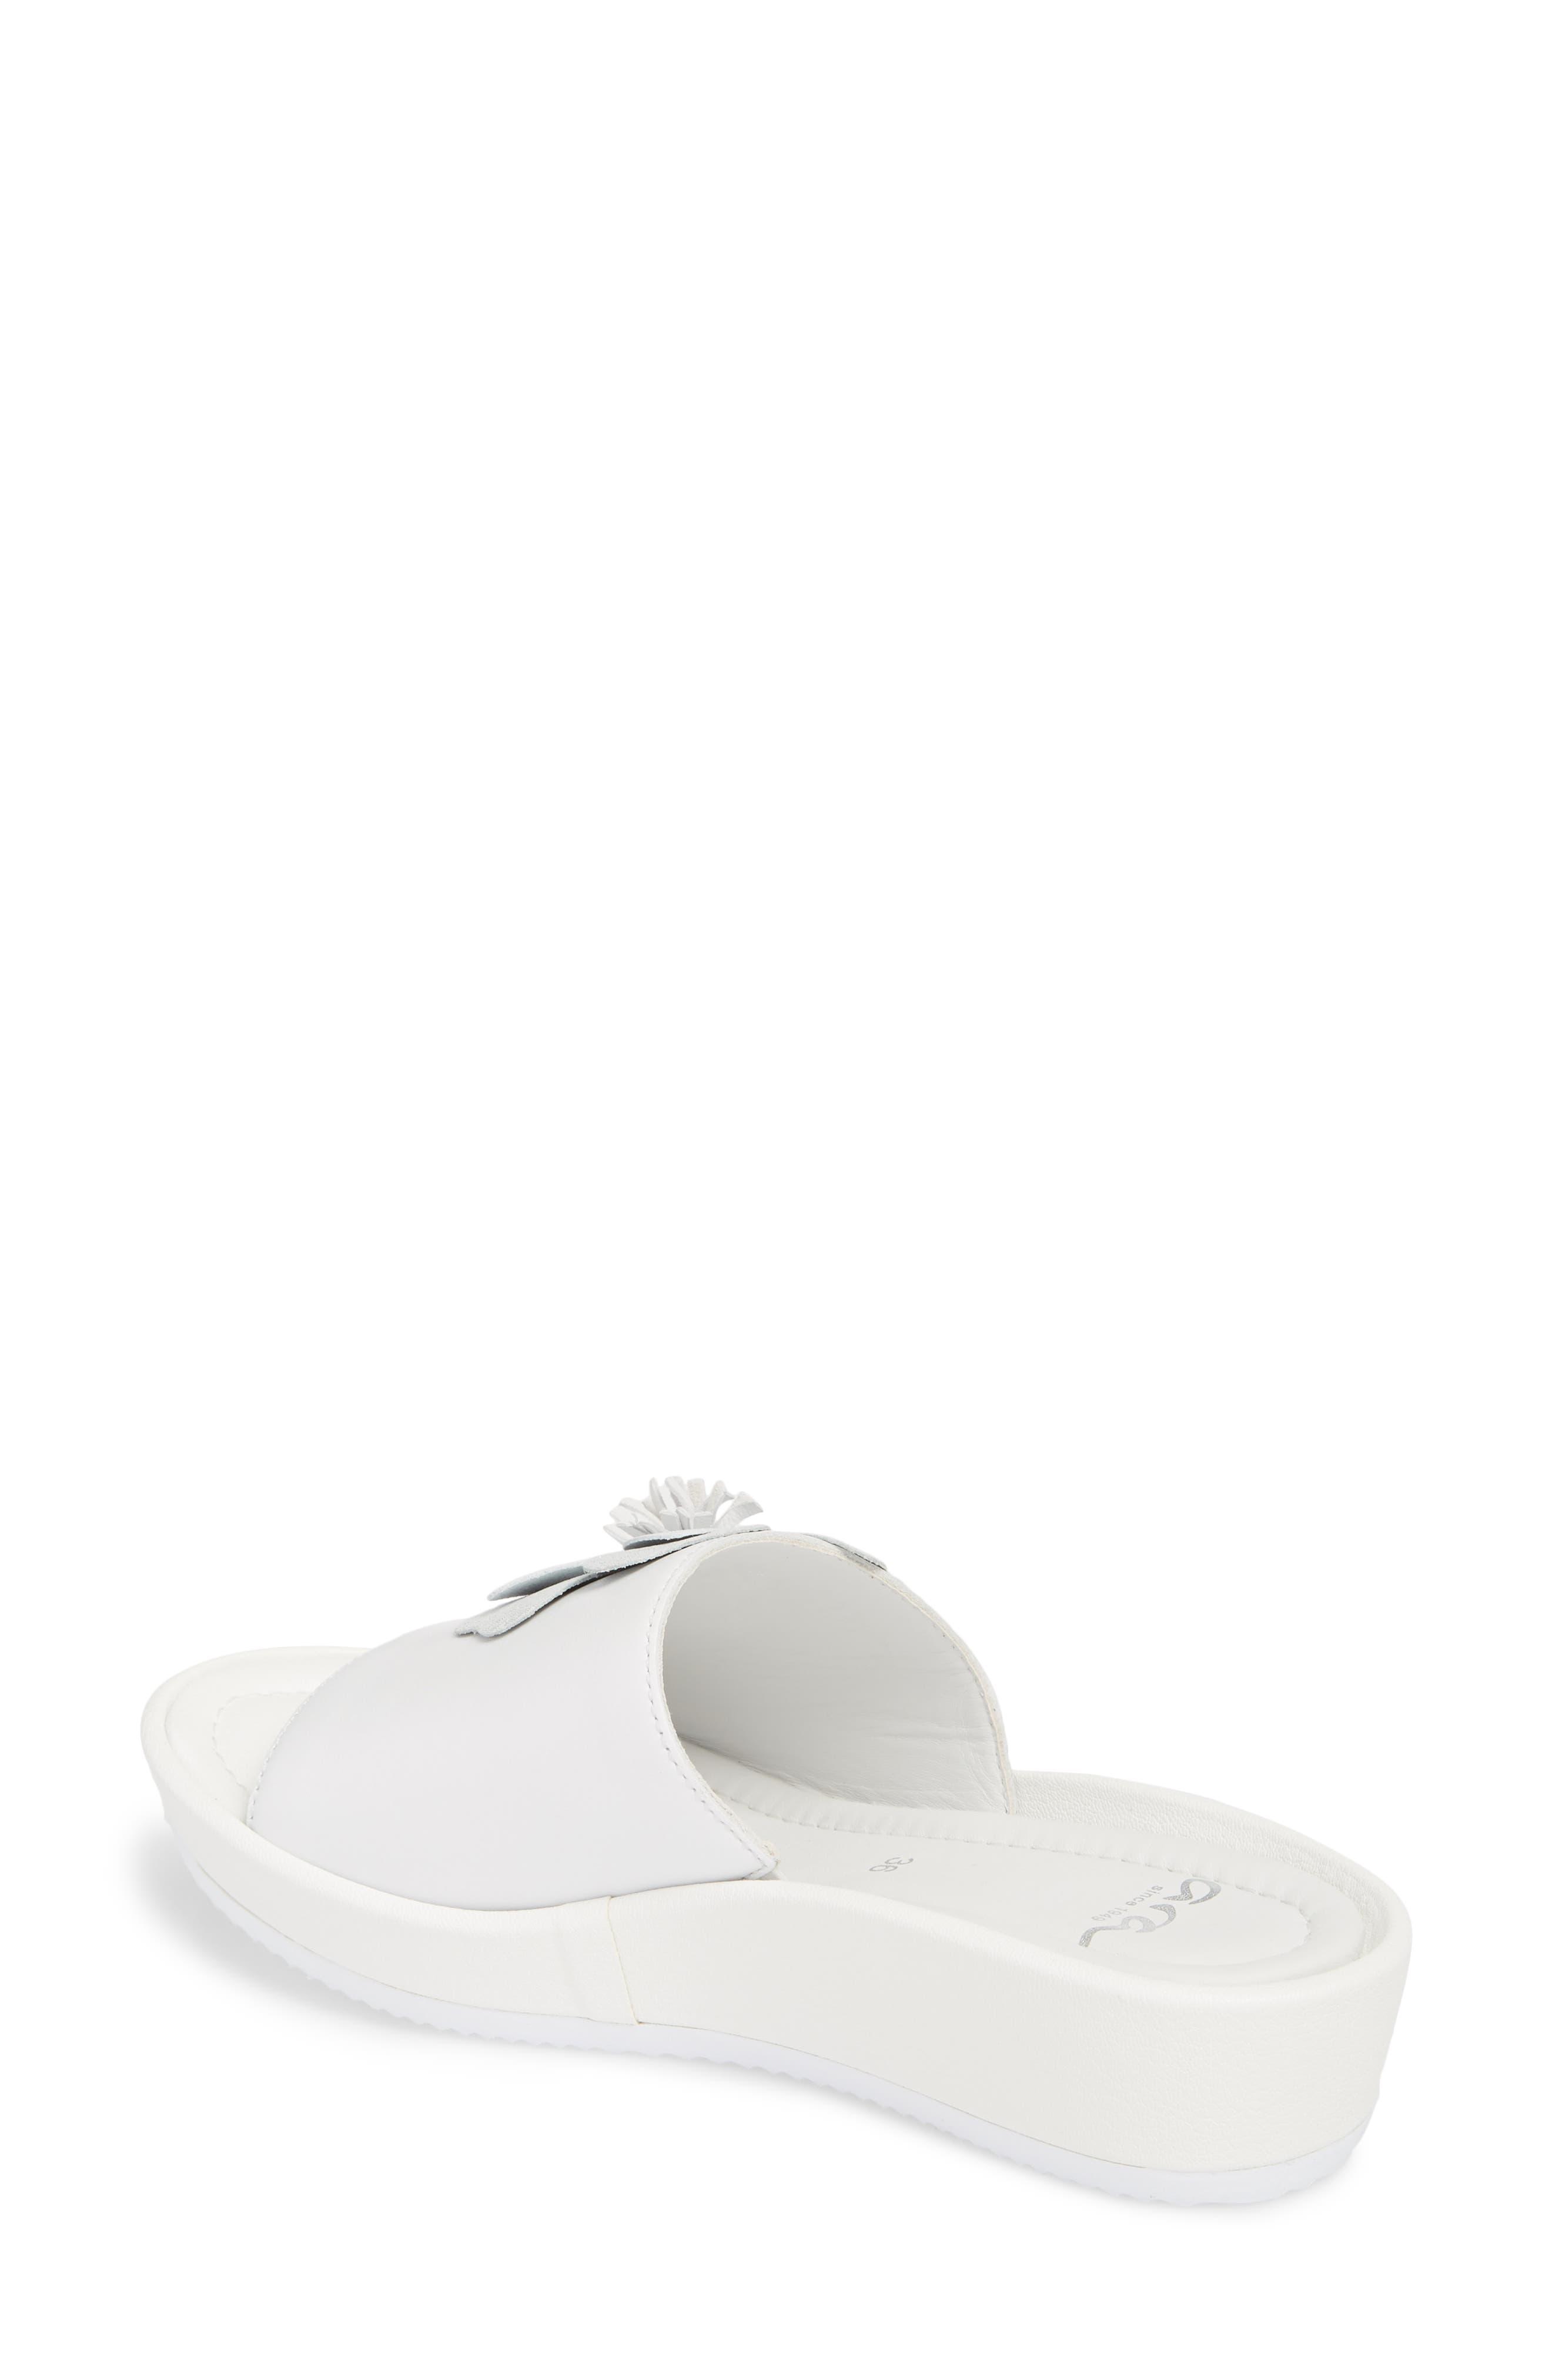 Thea Wedge Slide Sandal,                             Alternate thumbnail 2, color,                             WHITE LEATHER